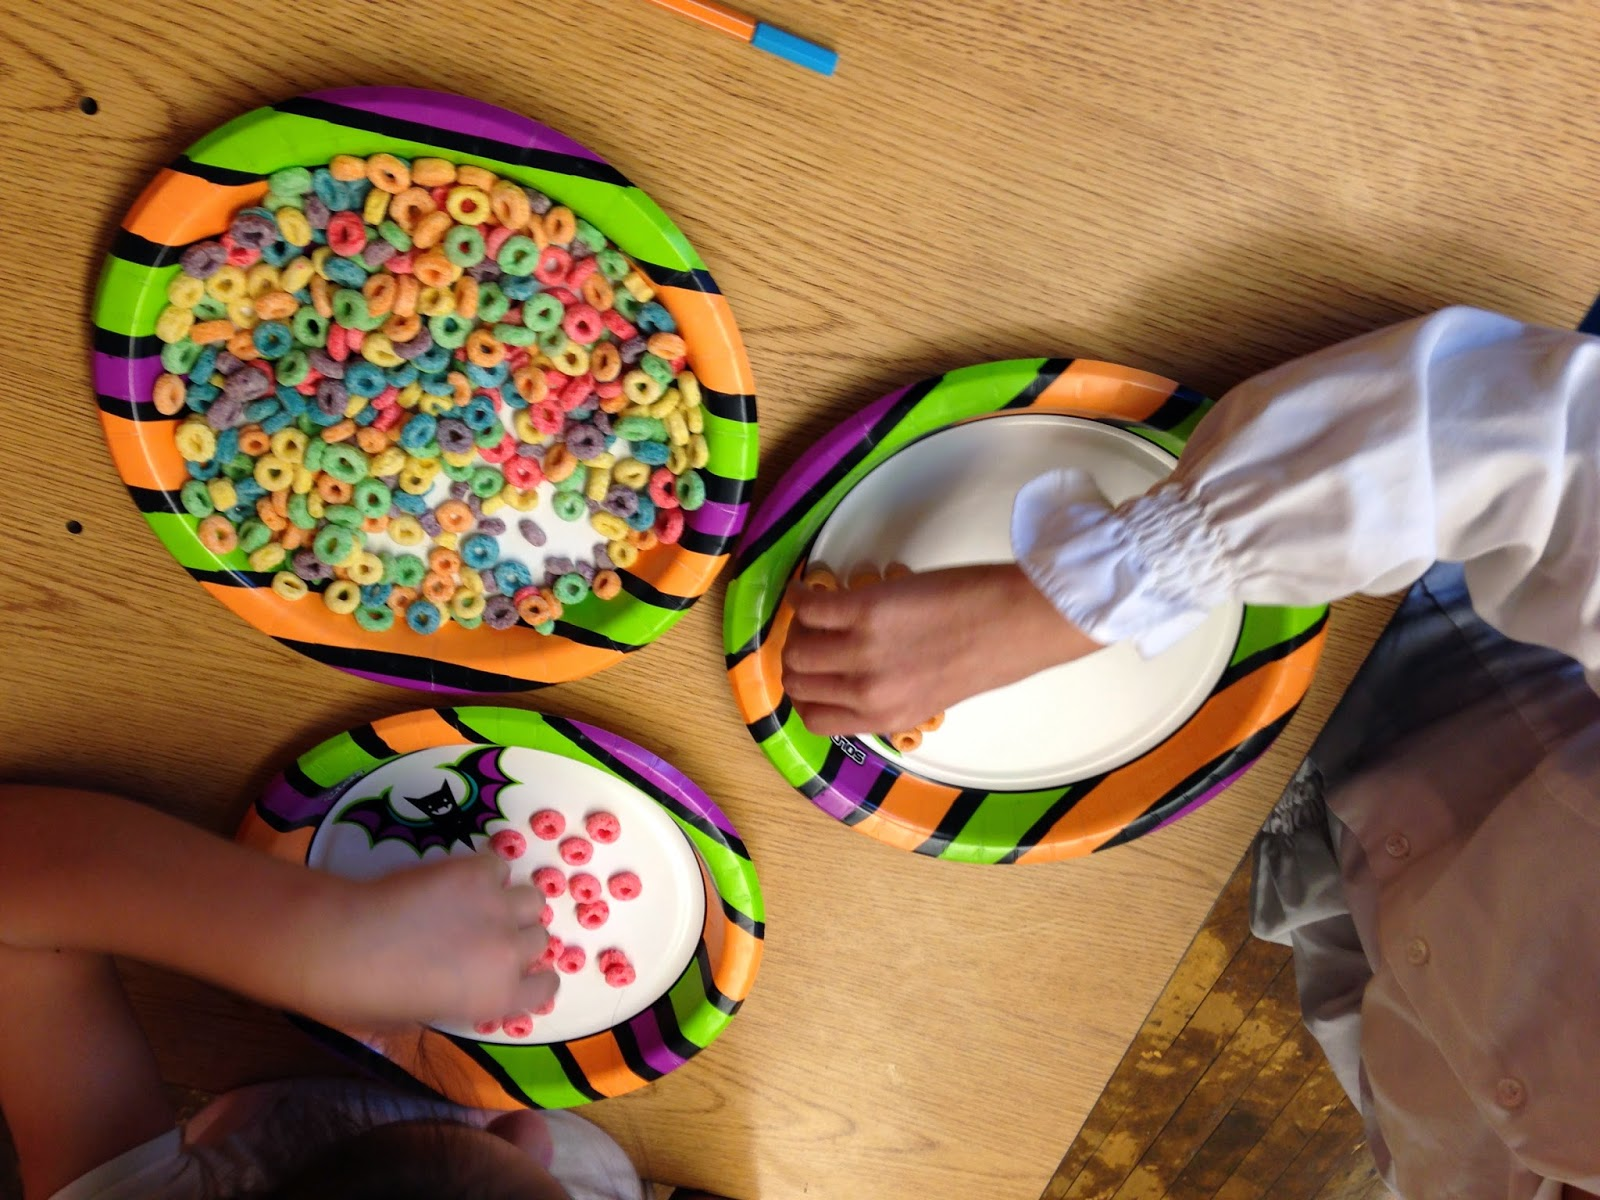 Autism Tank Rainbow Craftivity With Fruit Loops